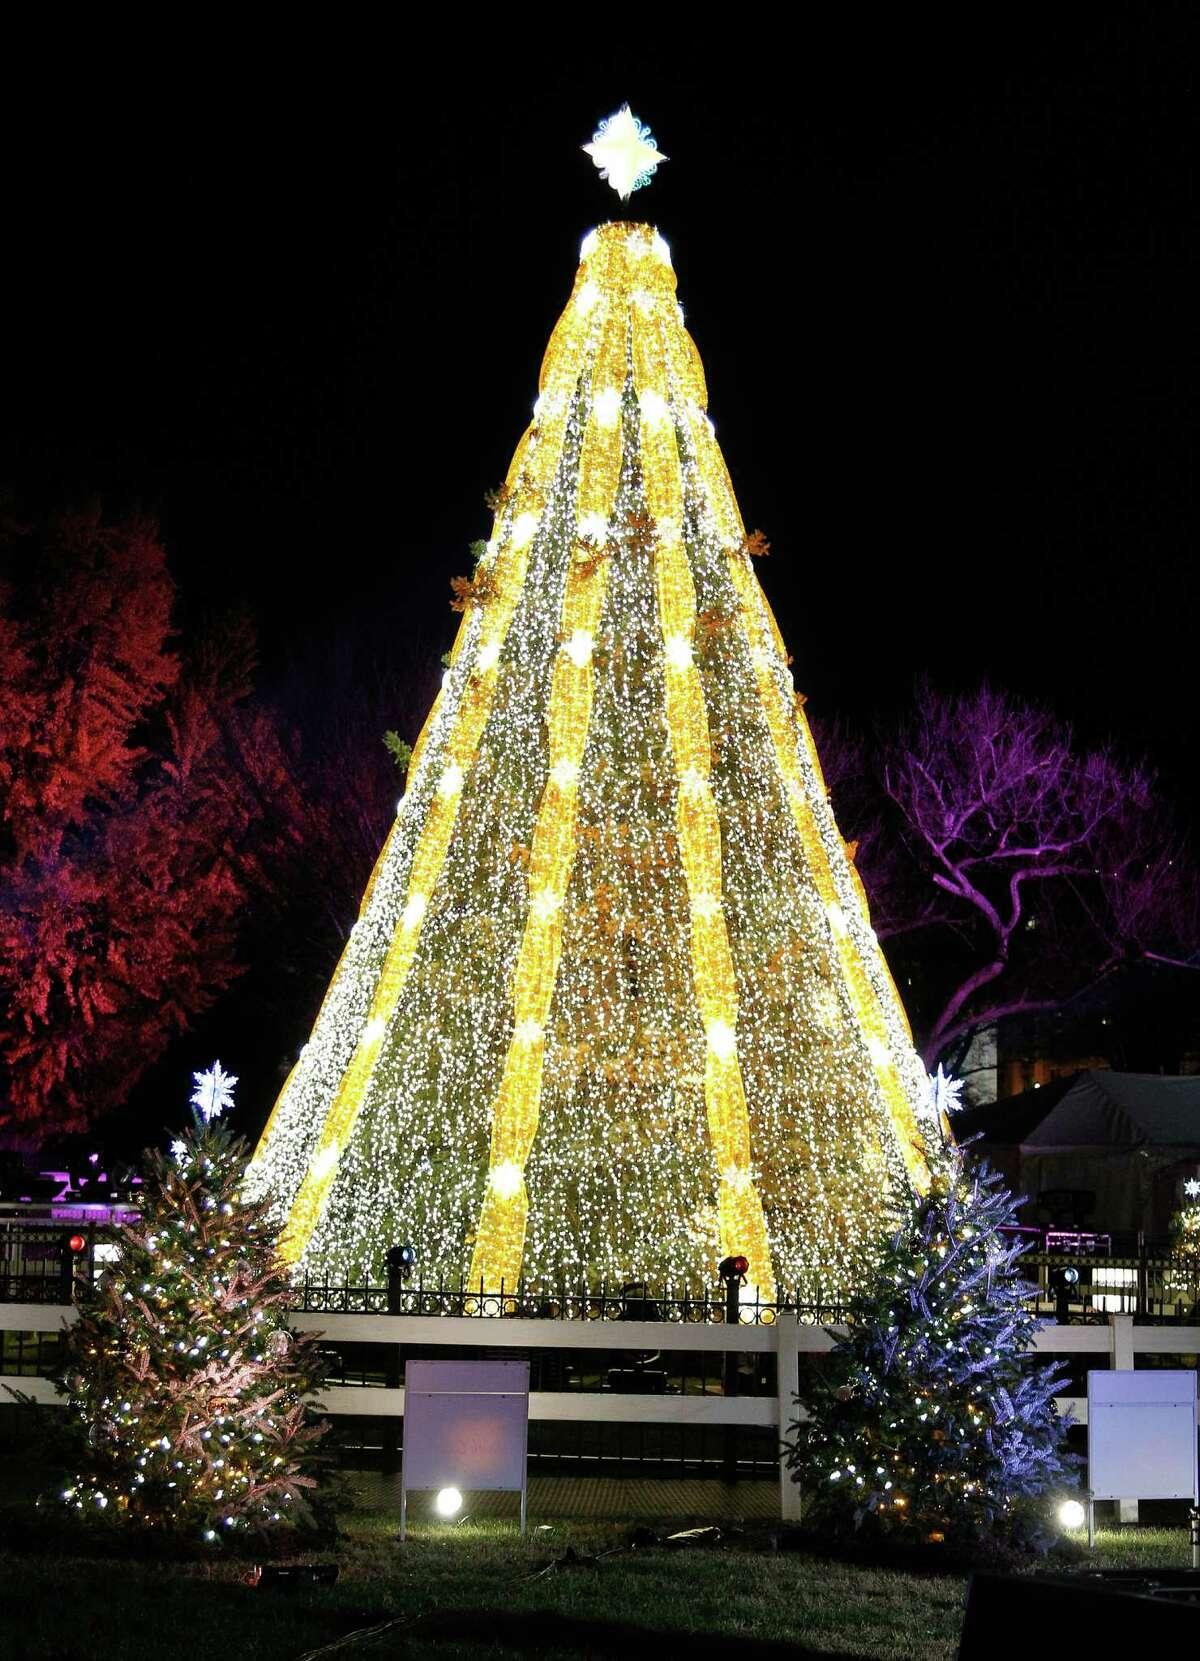 The National Christmas Tree Lighting Ceremony in President's Park on Thursday, December 3, 2015 in Washington, DC.